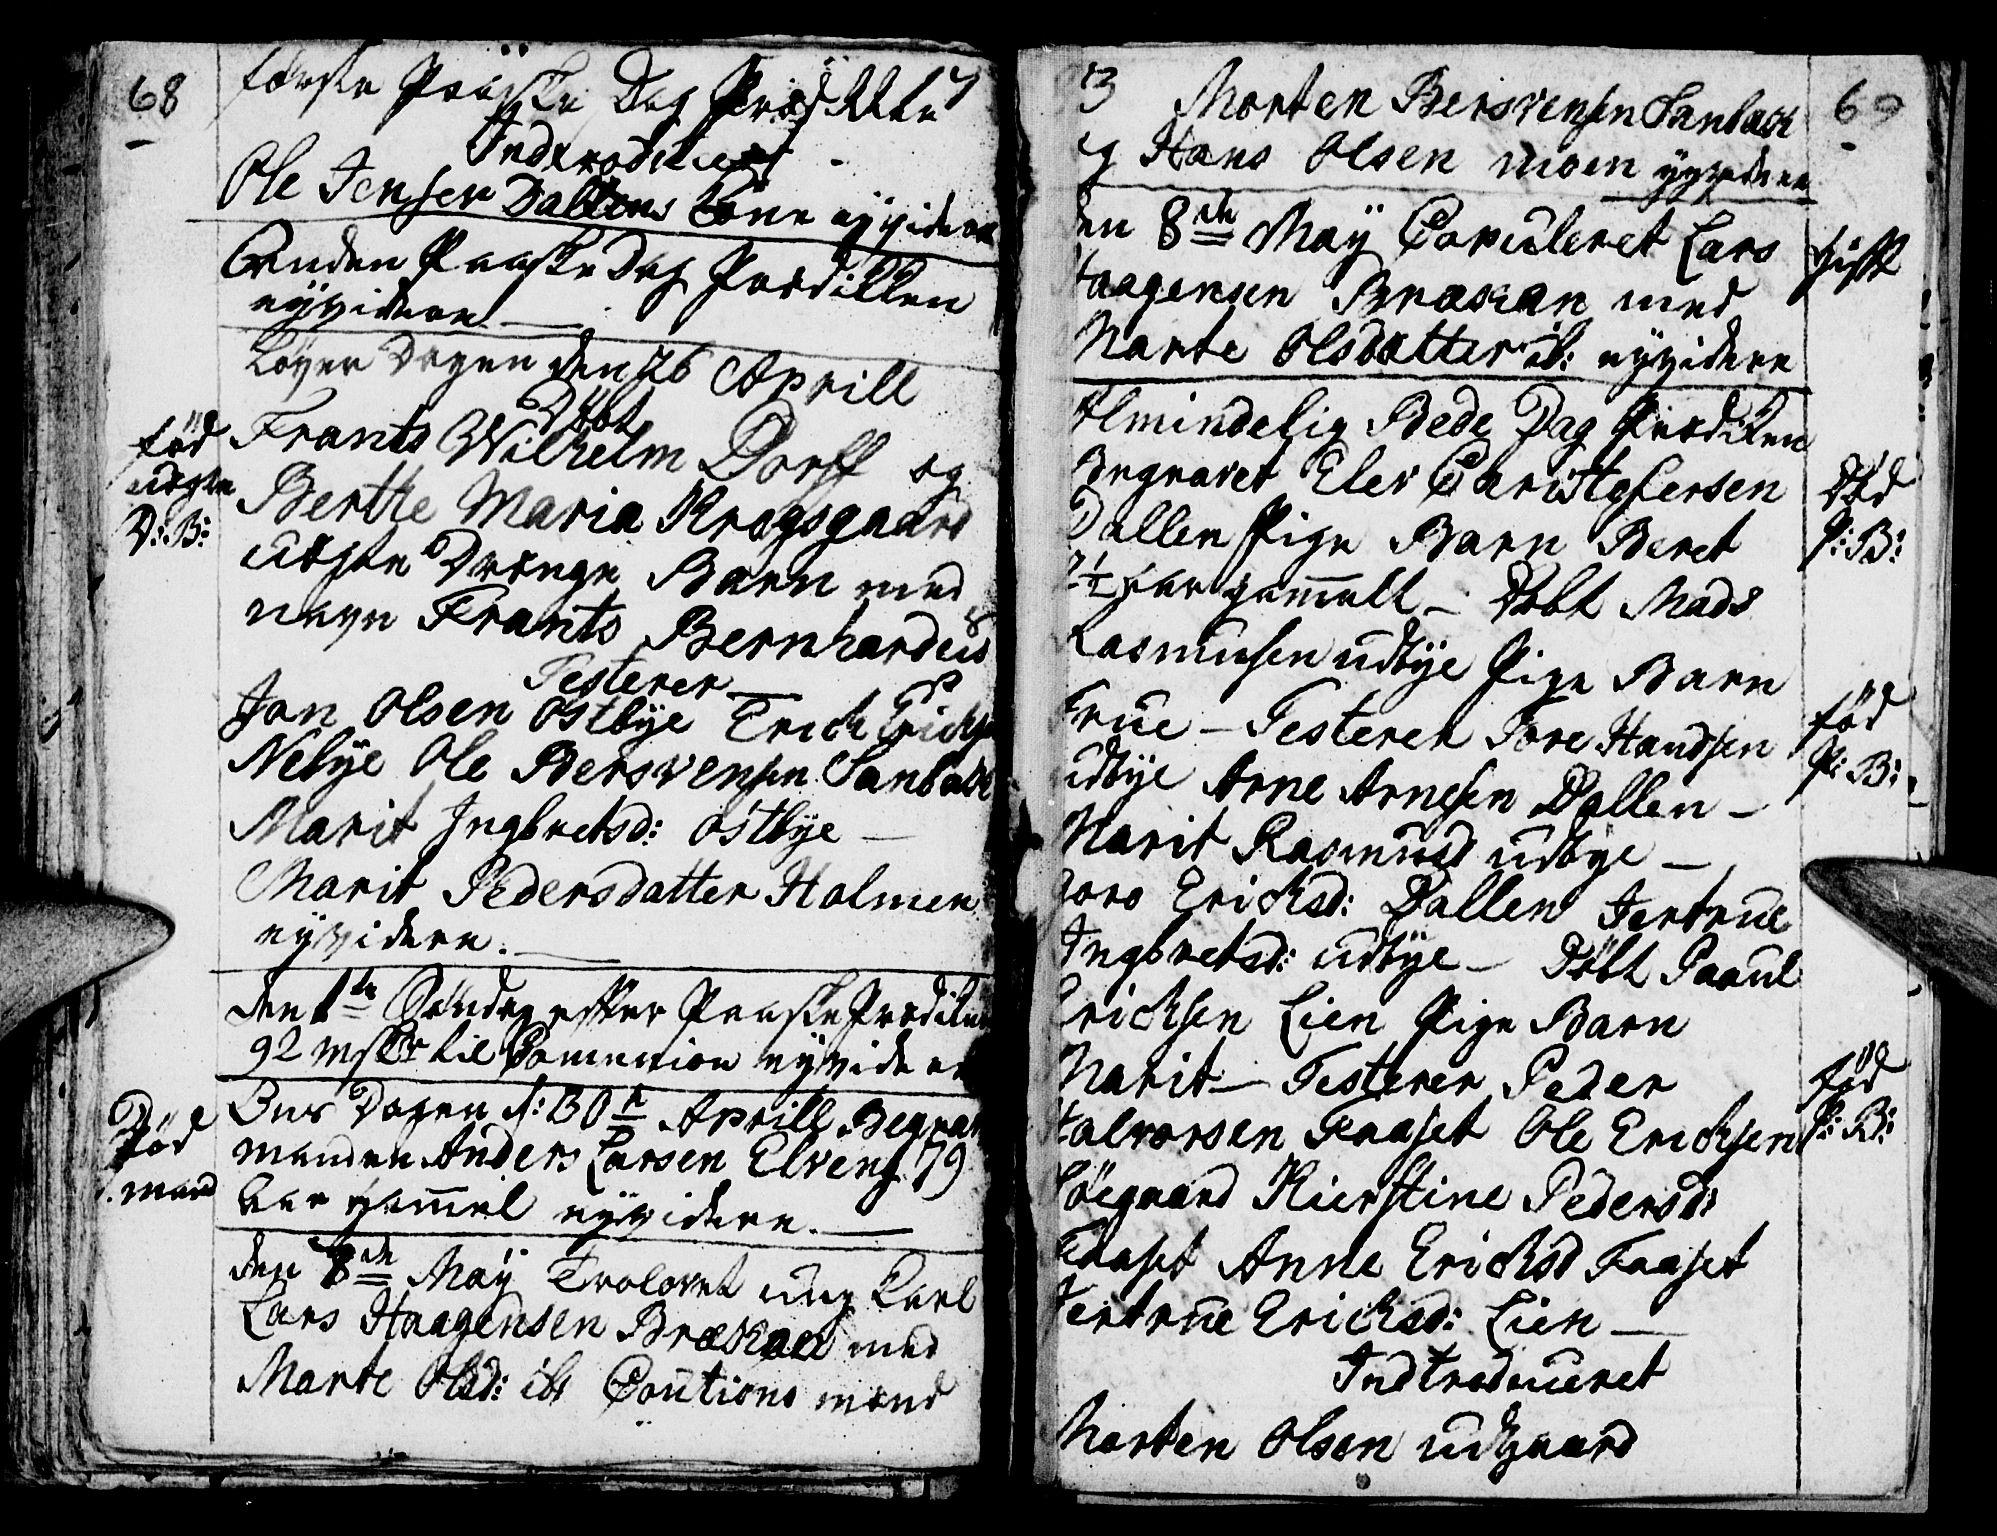 SAH, Tynset prestekontor, Ministerialbok nr. 12, 1780-1784, s. 68-69